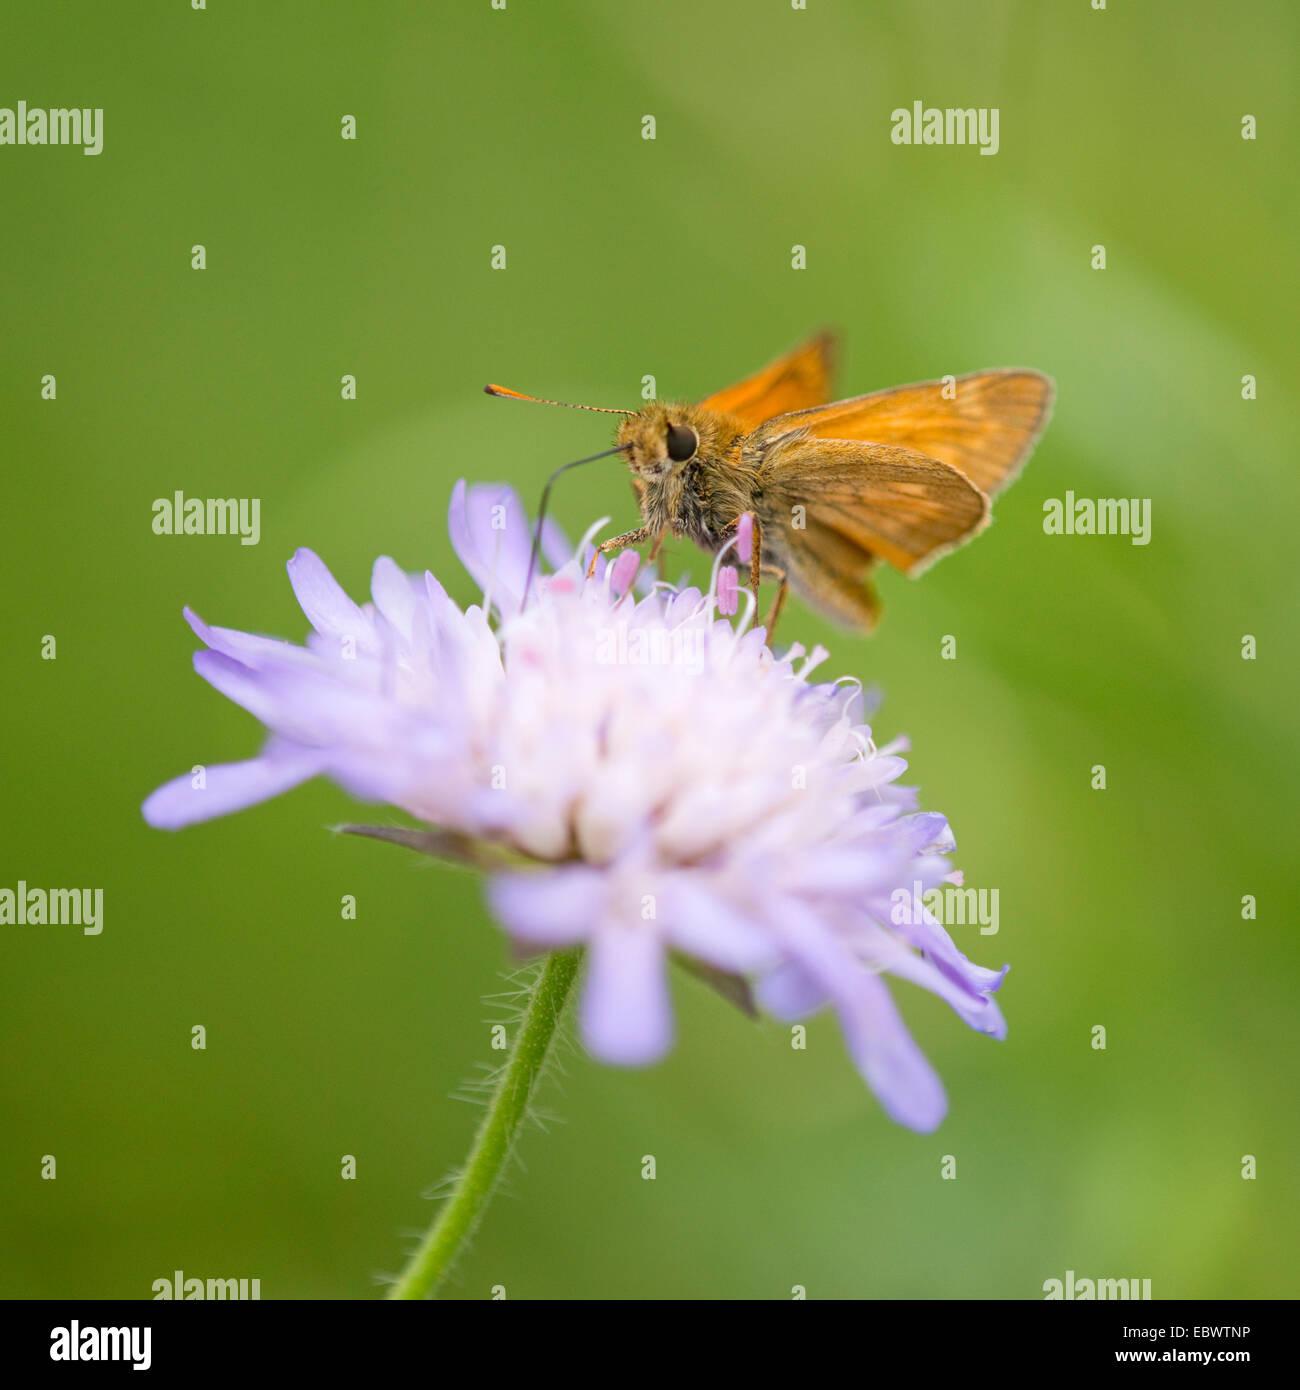 Gran Capitán Butterfly (Ochlodes sylvanus Ochlodes) venatus, chupando el néctar de una flor de un campo (Knautia Scabious Foto de stock